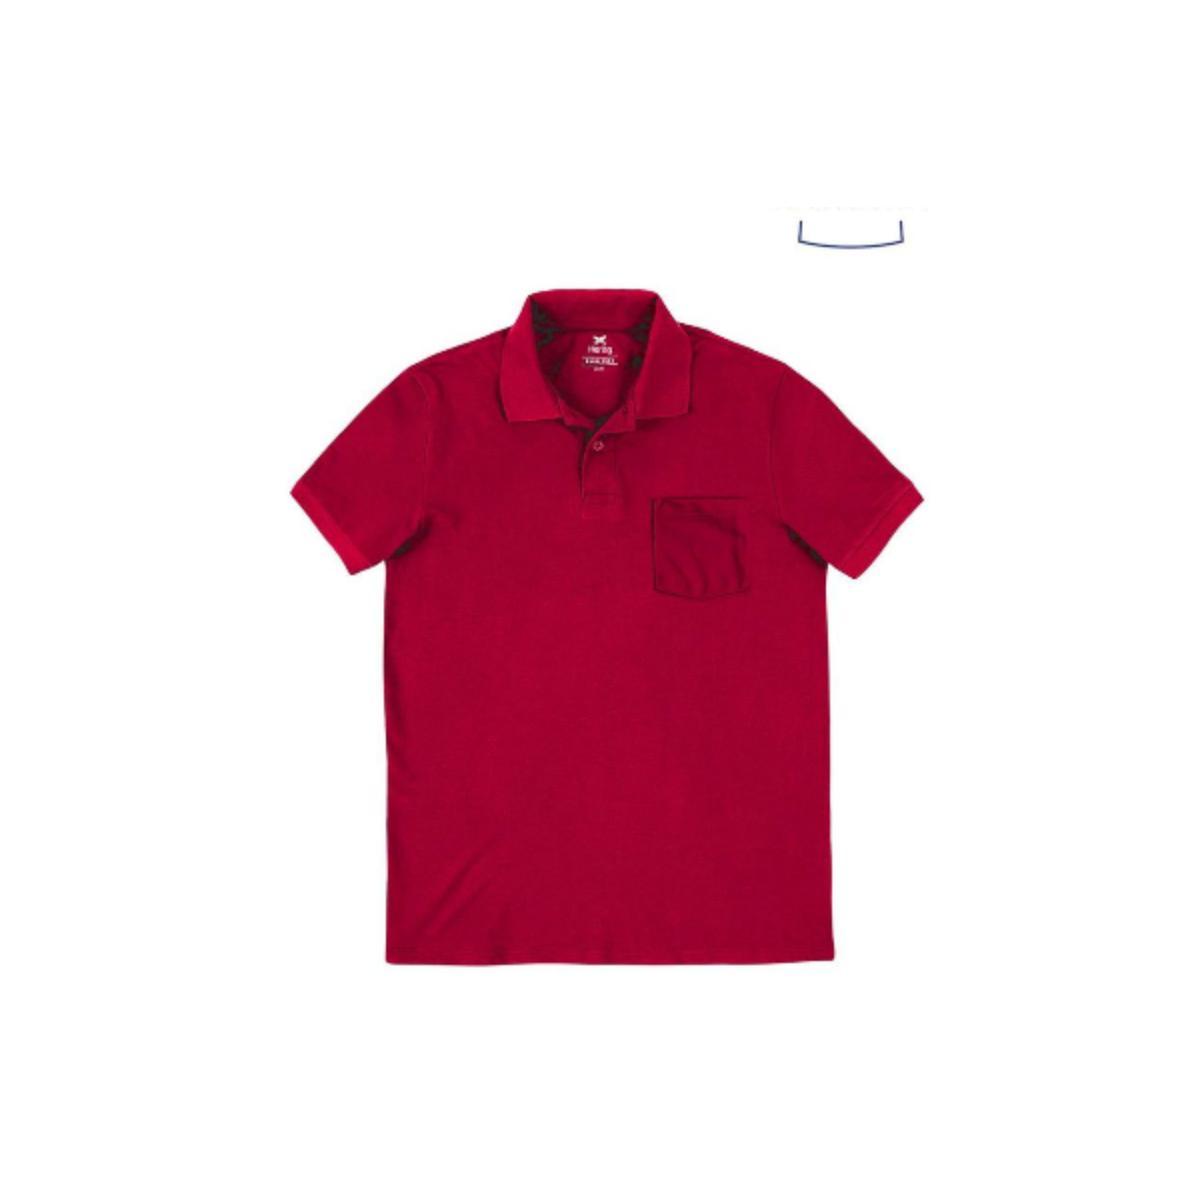 Camisa Masculina Hering 3m2a Rpyen Vermelho